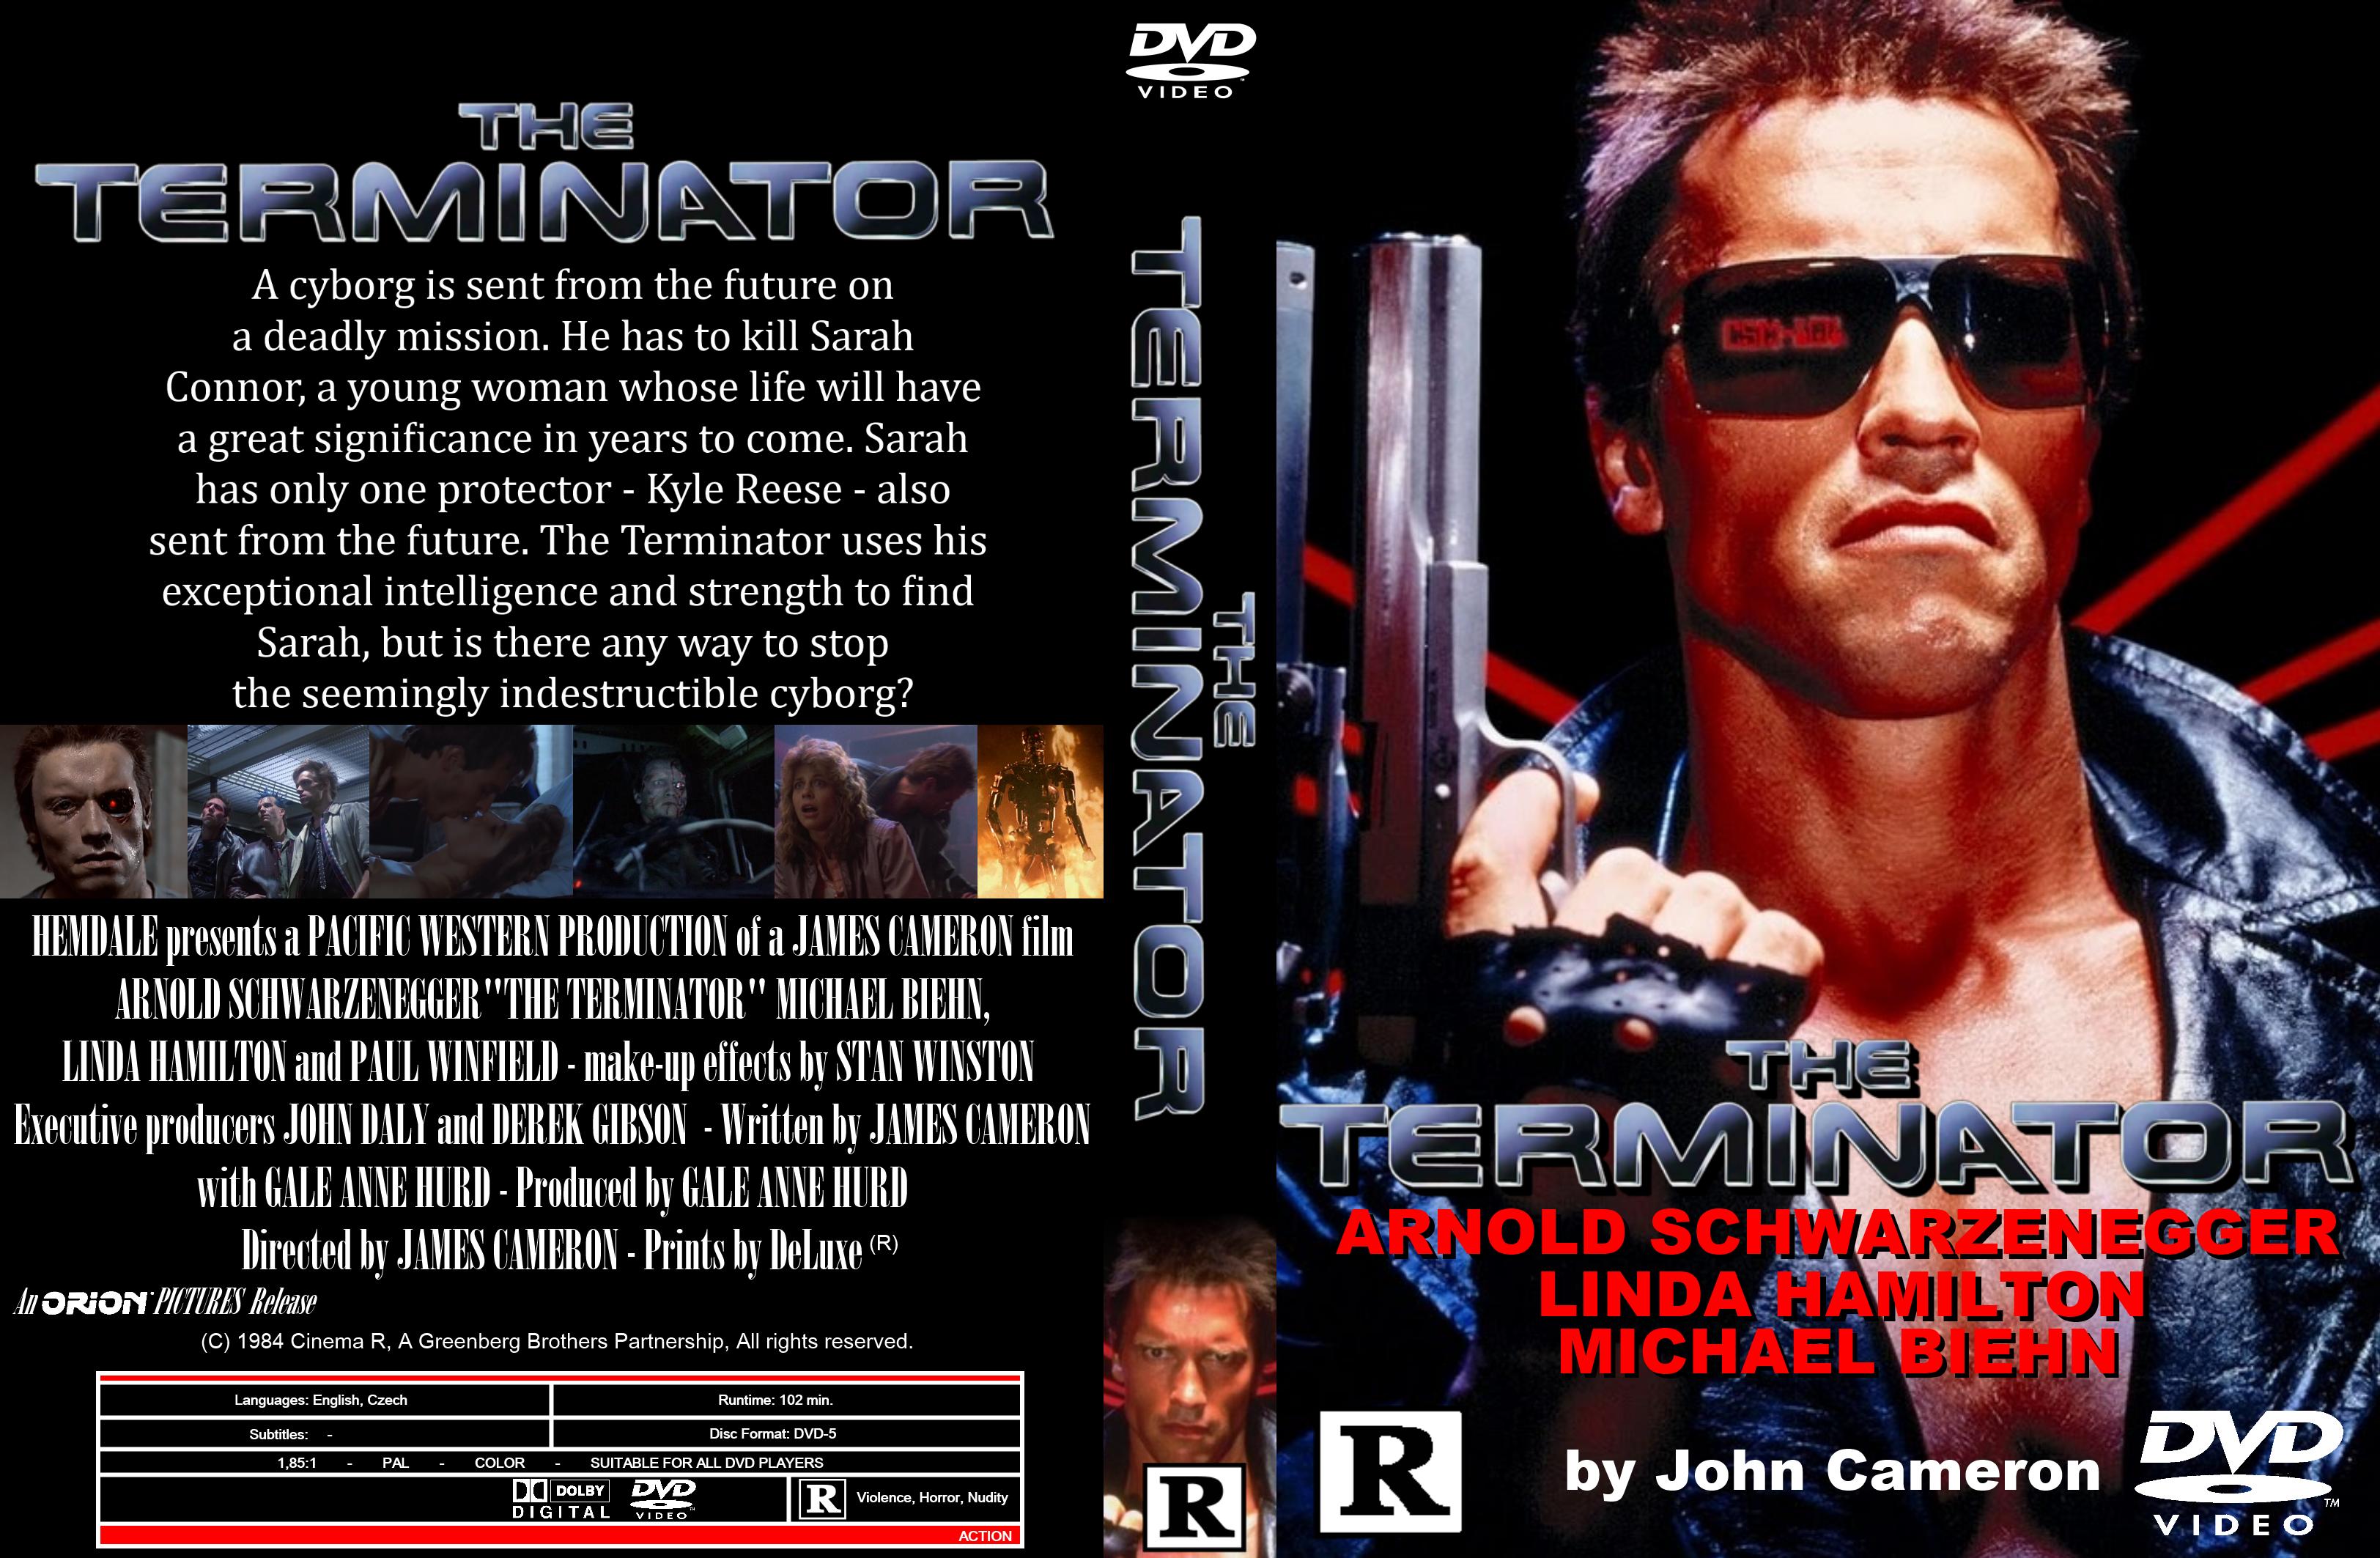 Terminator Bluray Custom Cover by elmundodedata on DeviantArt